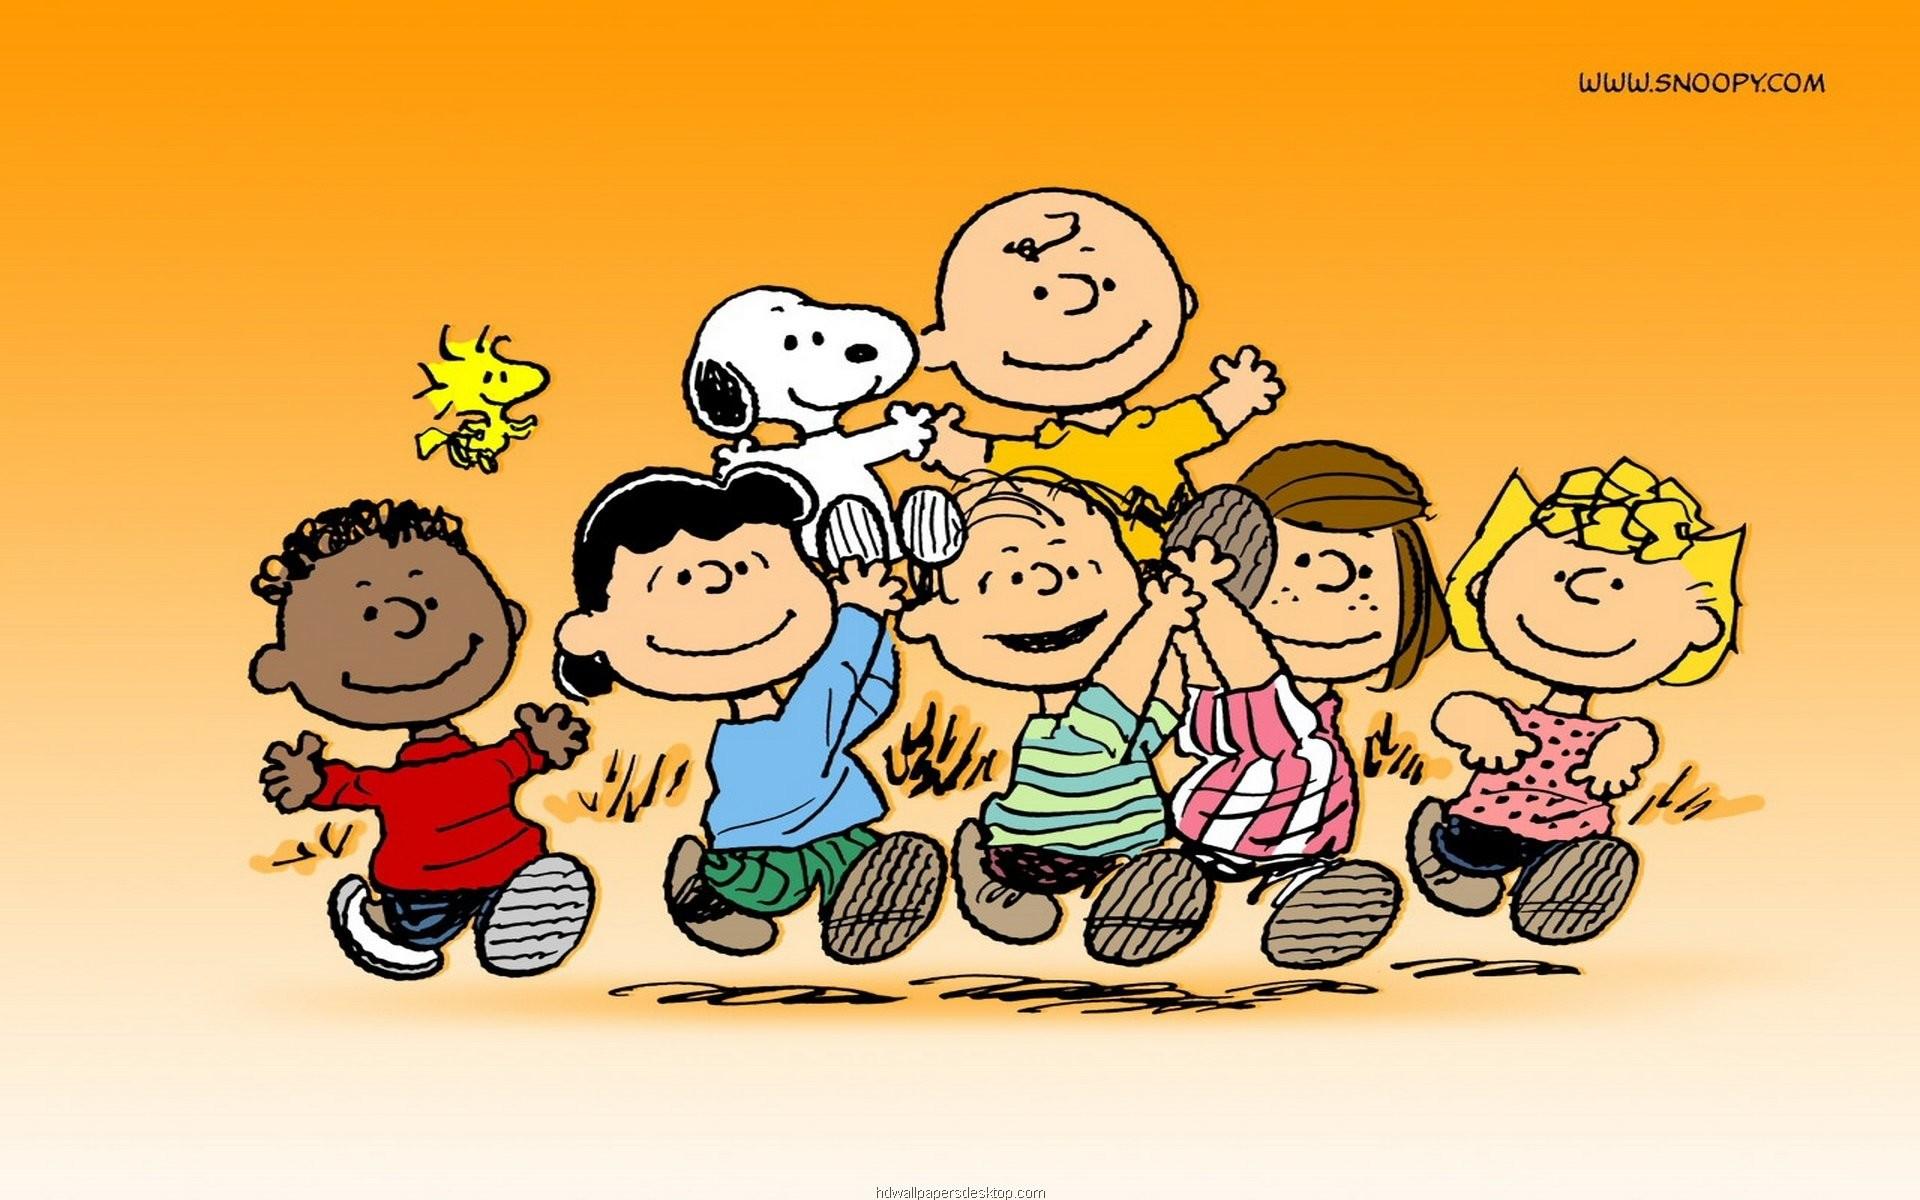 peanuts gang wallpaper (52+ images)